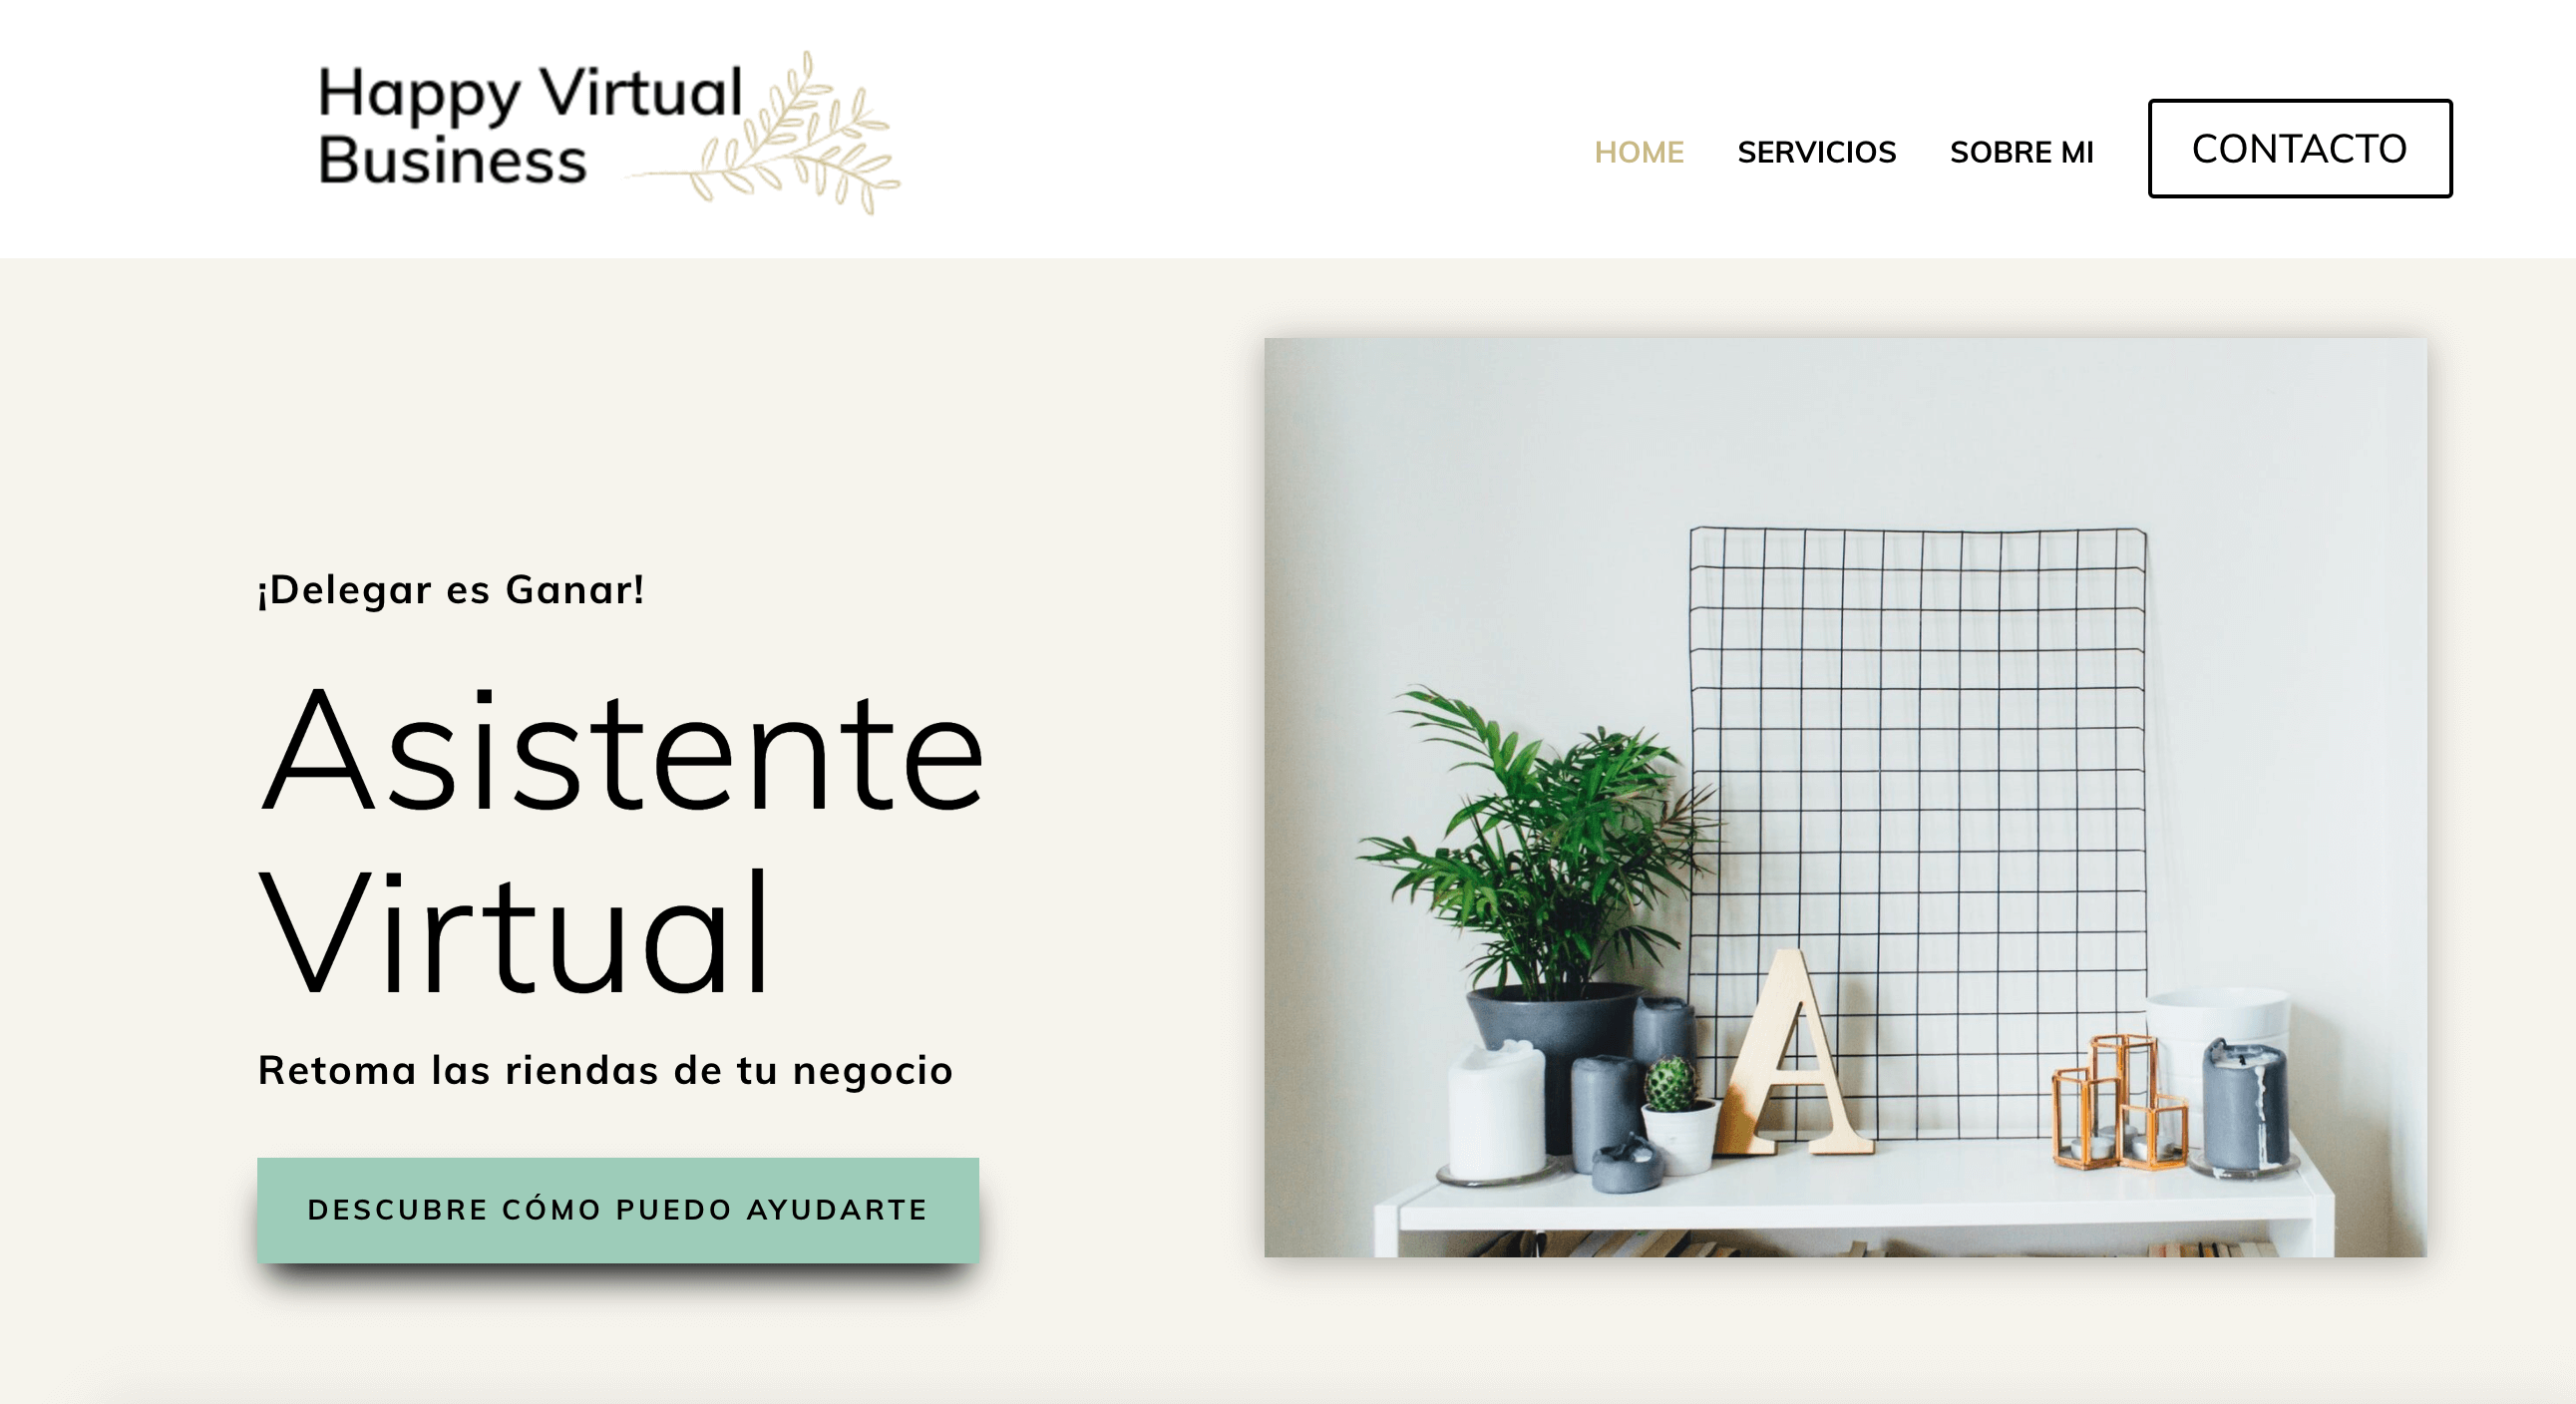 happyvitualbusiness assitente virtual mooiwebdesign